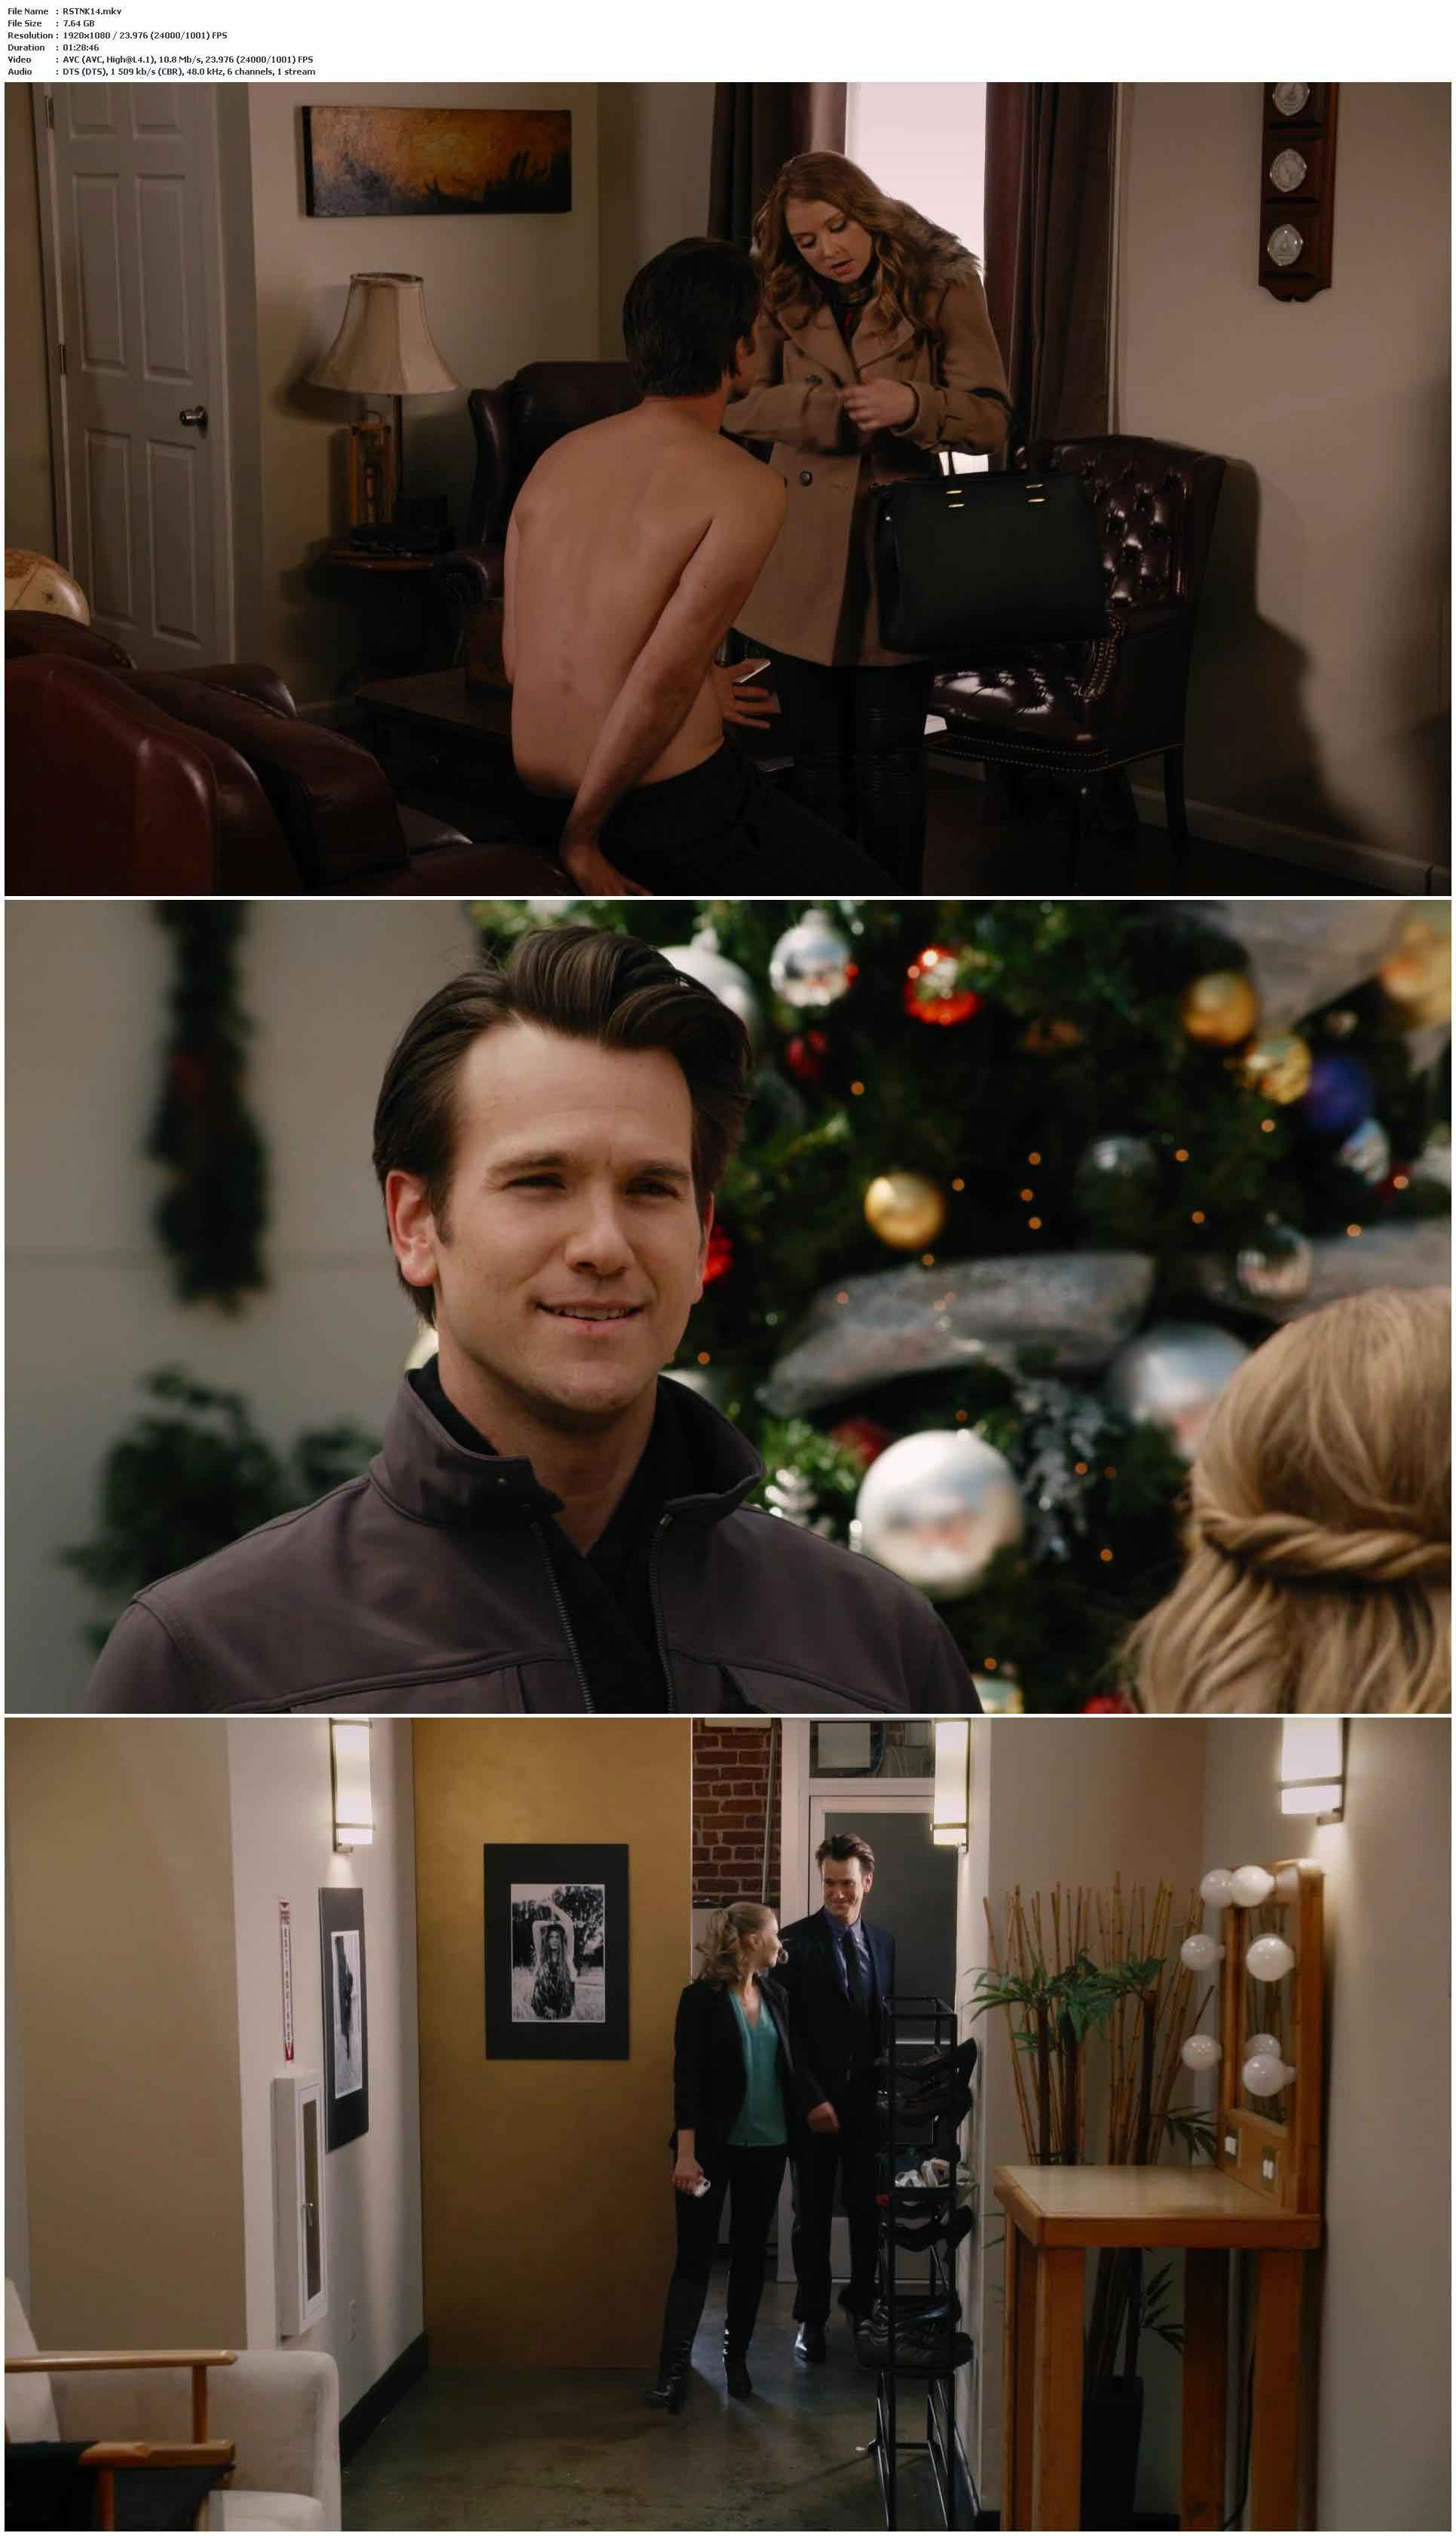 A Christmas Kiss 2.A Christmas Kiss Ii 2014 Avaxhome